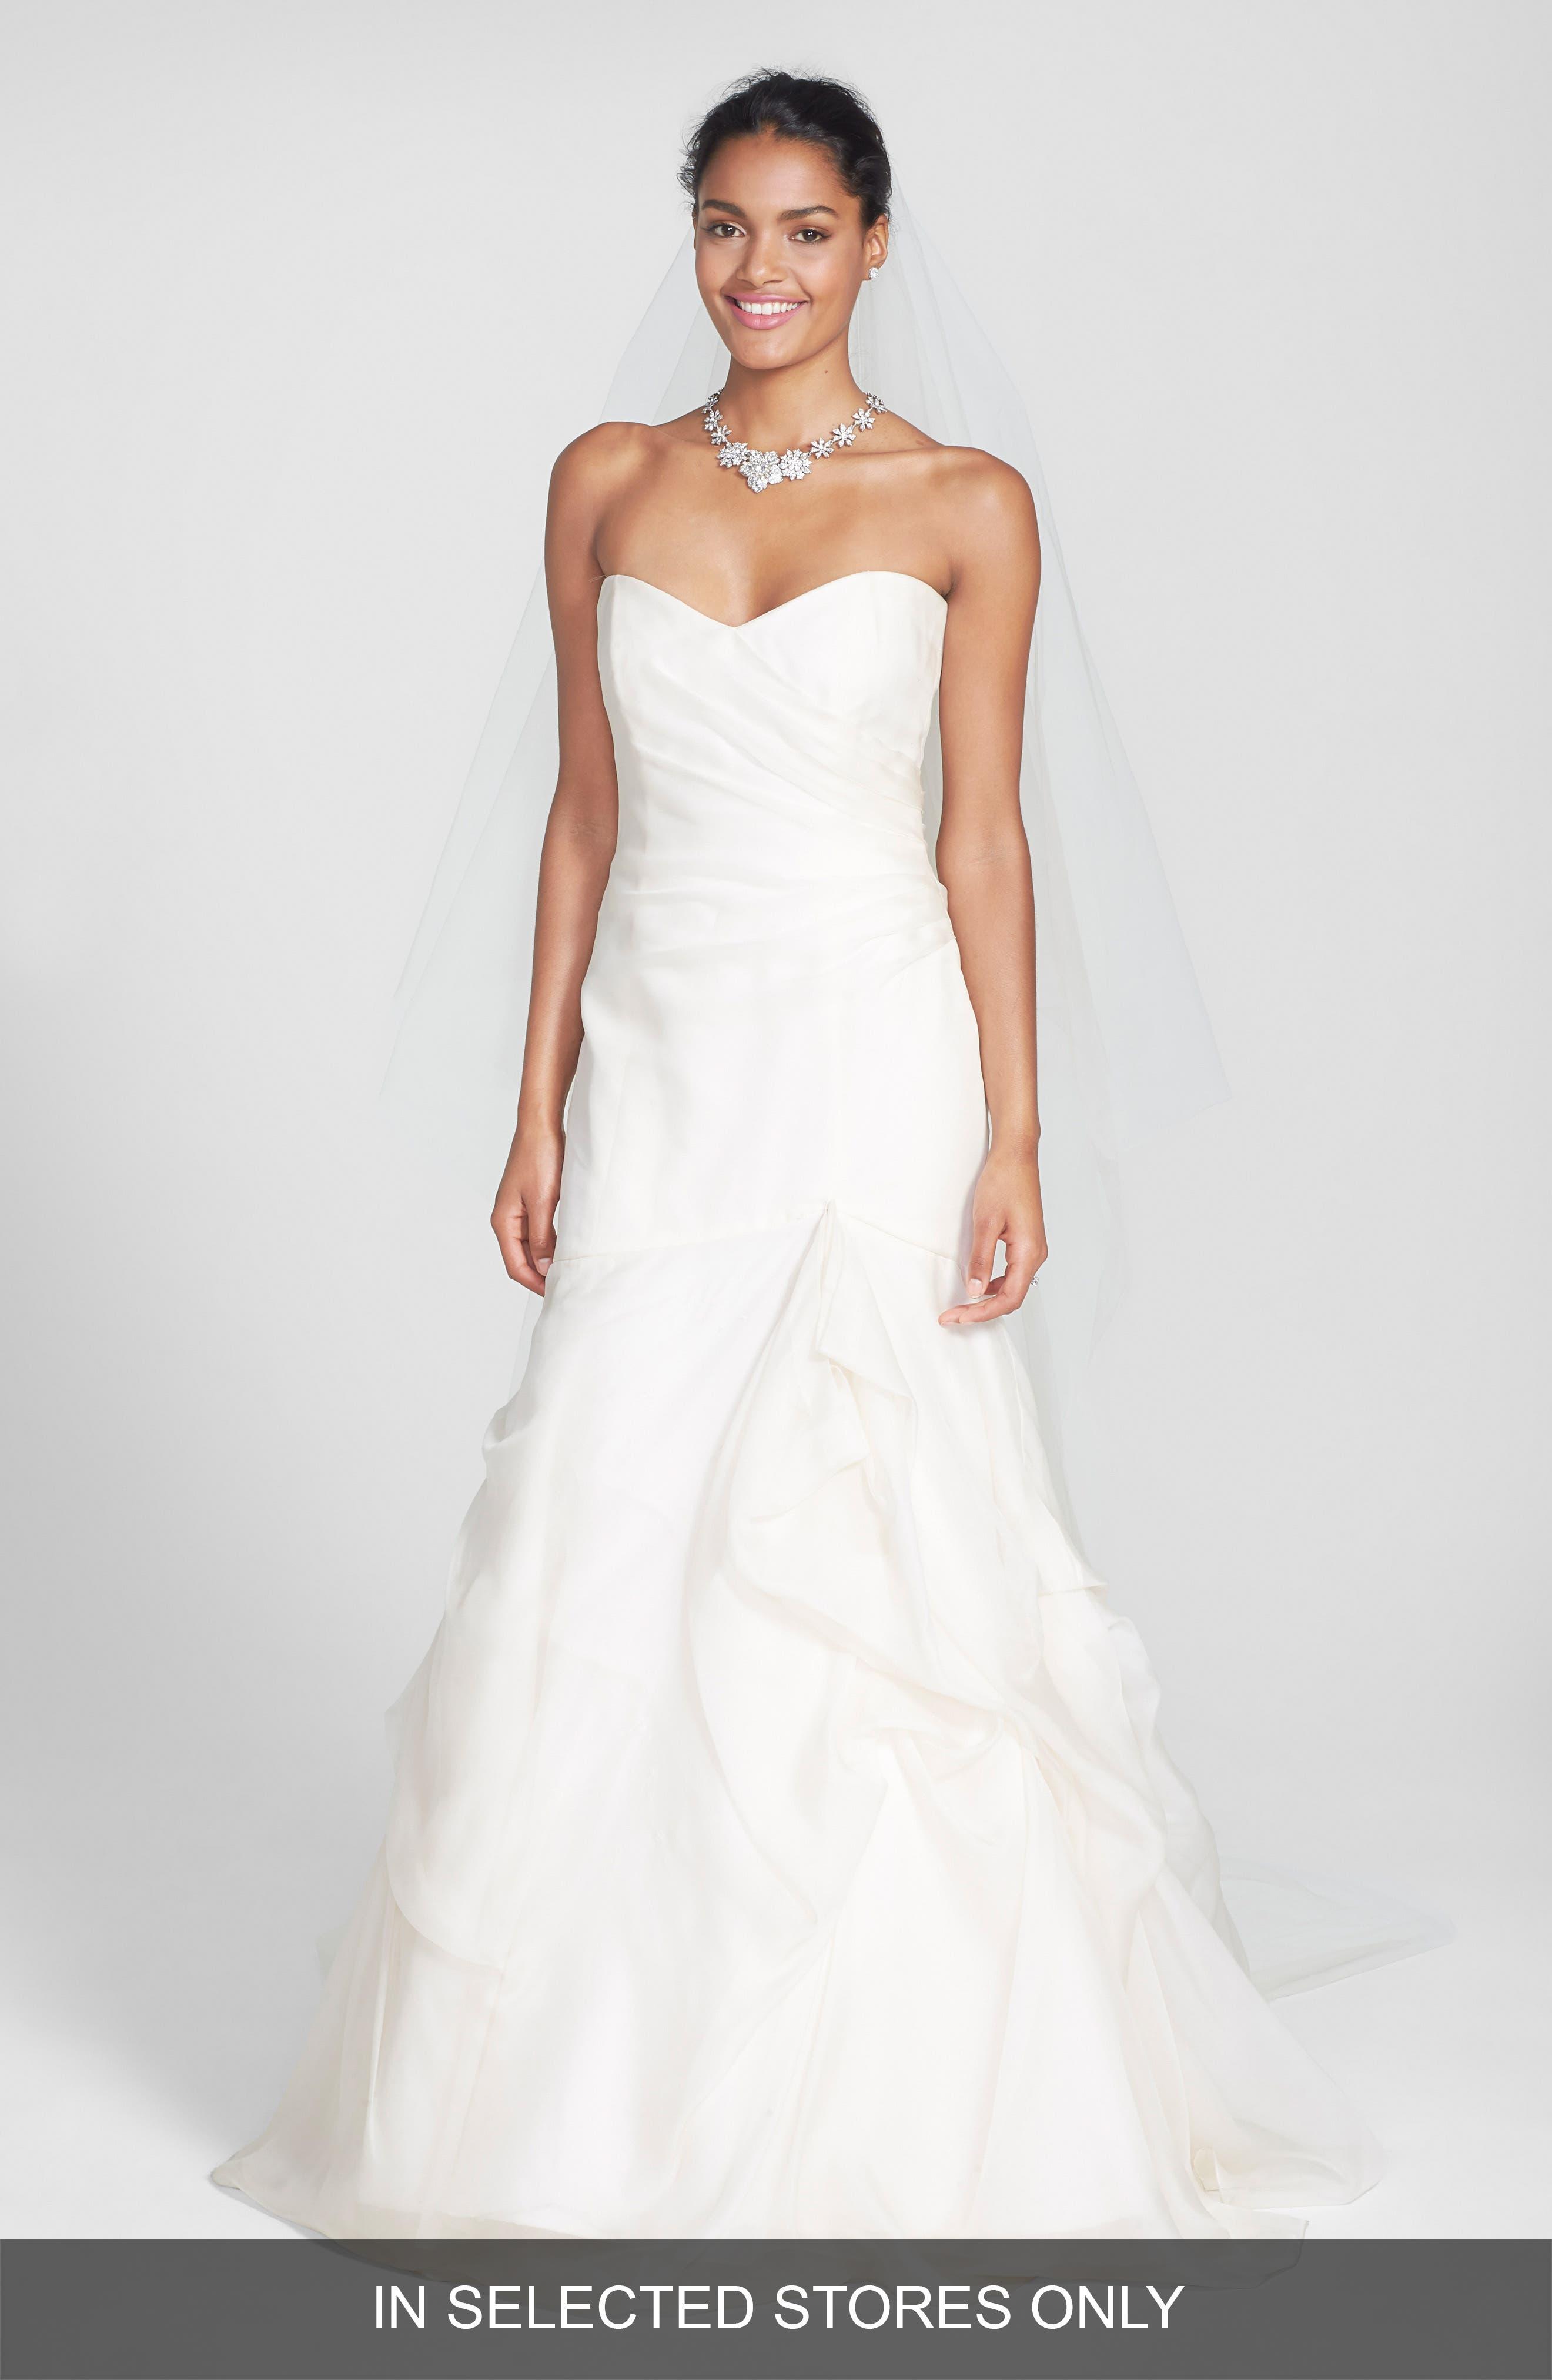 BLISS Monique Lhuillier Strapless Silk Organza Mermaid Wedding Dress (In Stores Only)